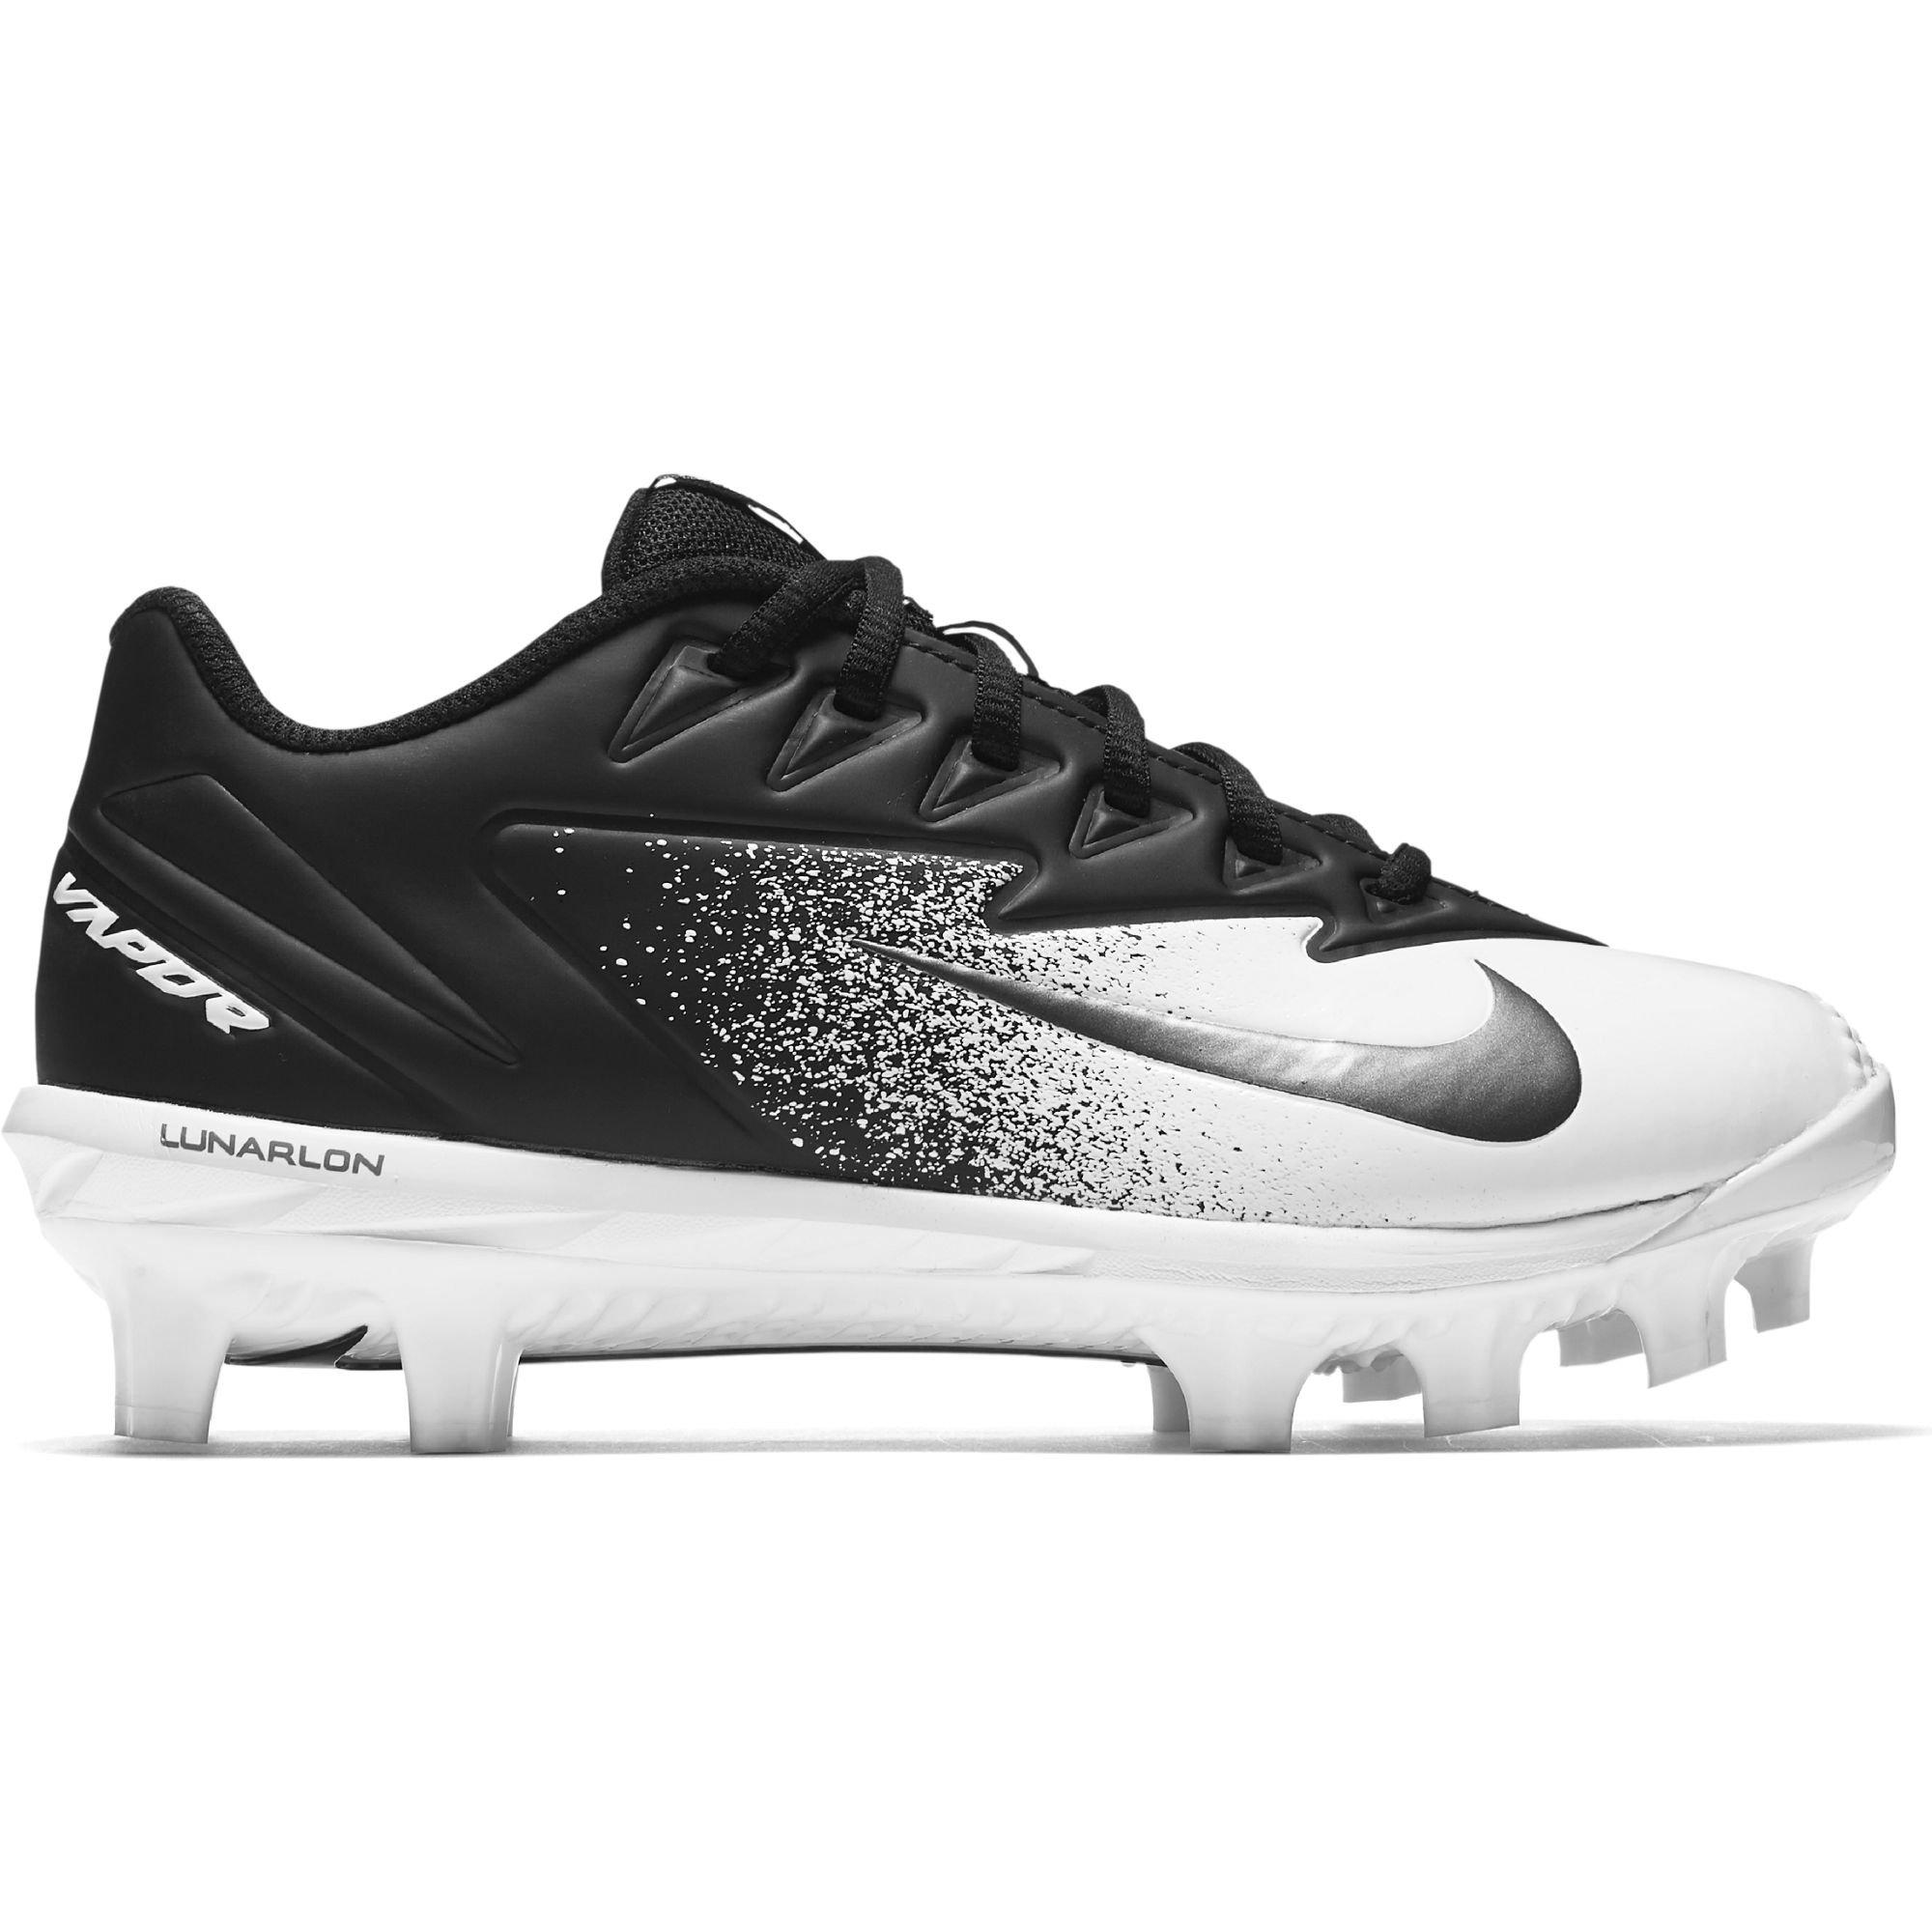 Nike Boy's Vapor Ultrafly Pro MCS Baseball Cleat Black/Metallic Silver/White Size 3 M US